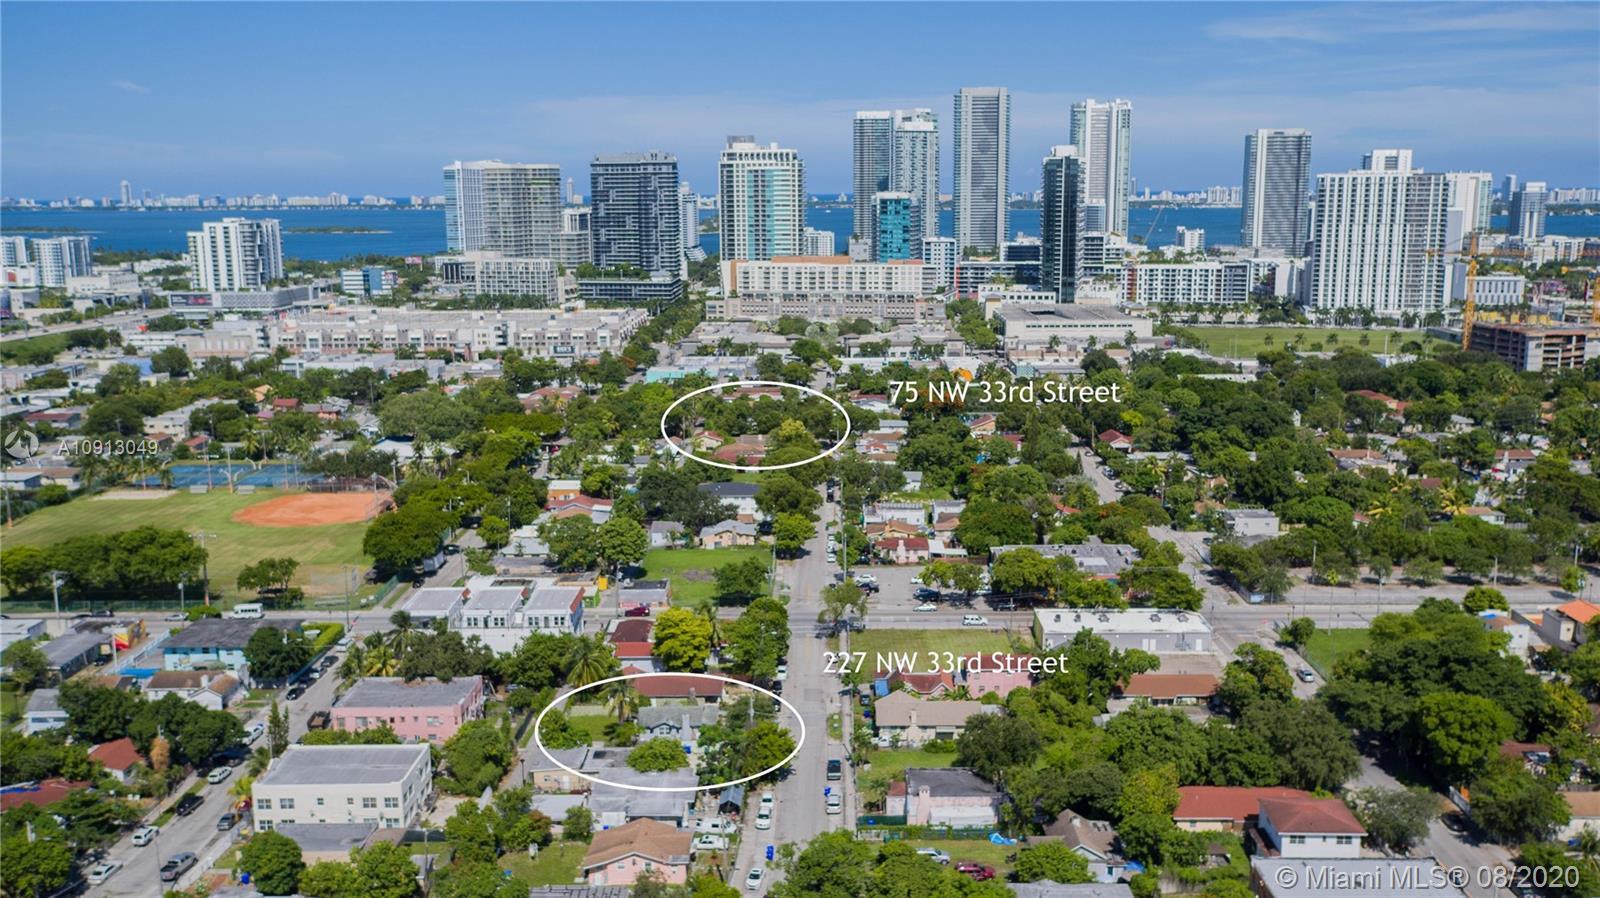 Wynwood - 227 NW 33rd St, Miami, FL 33127